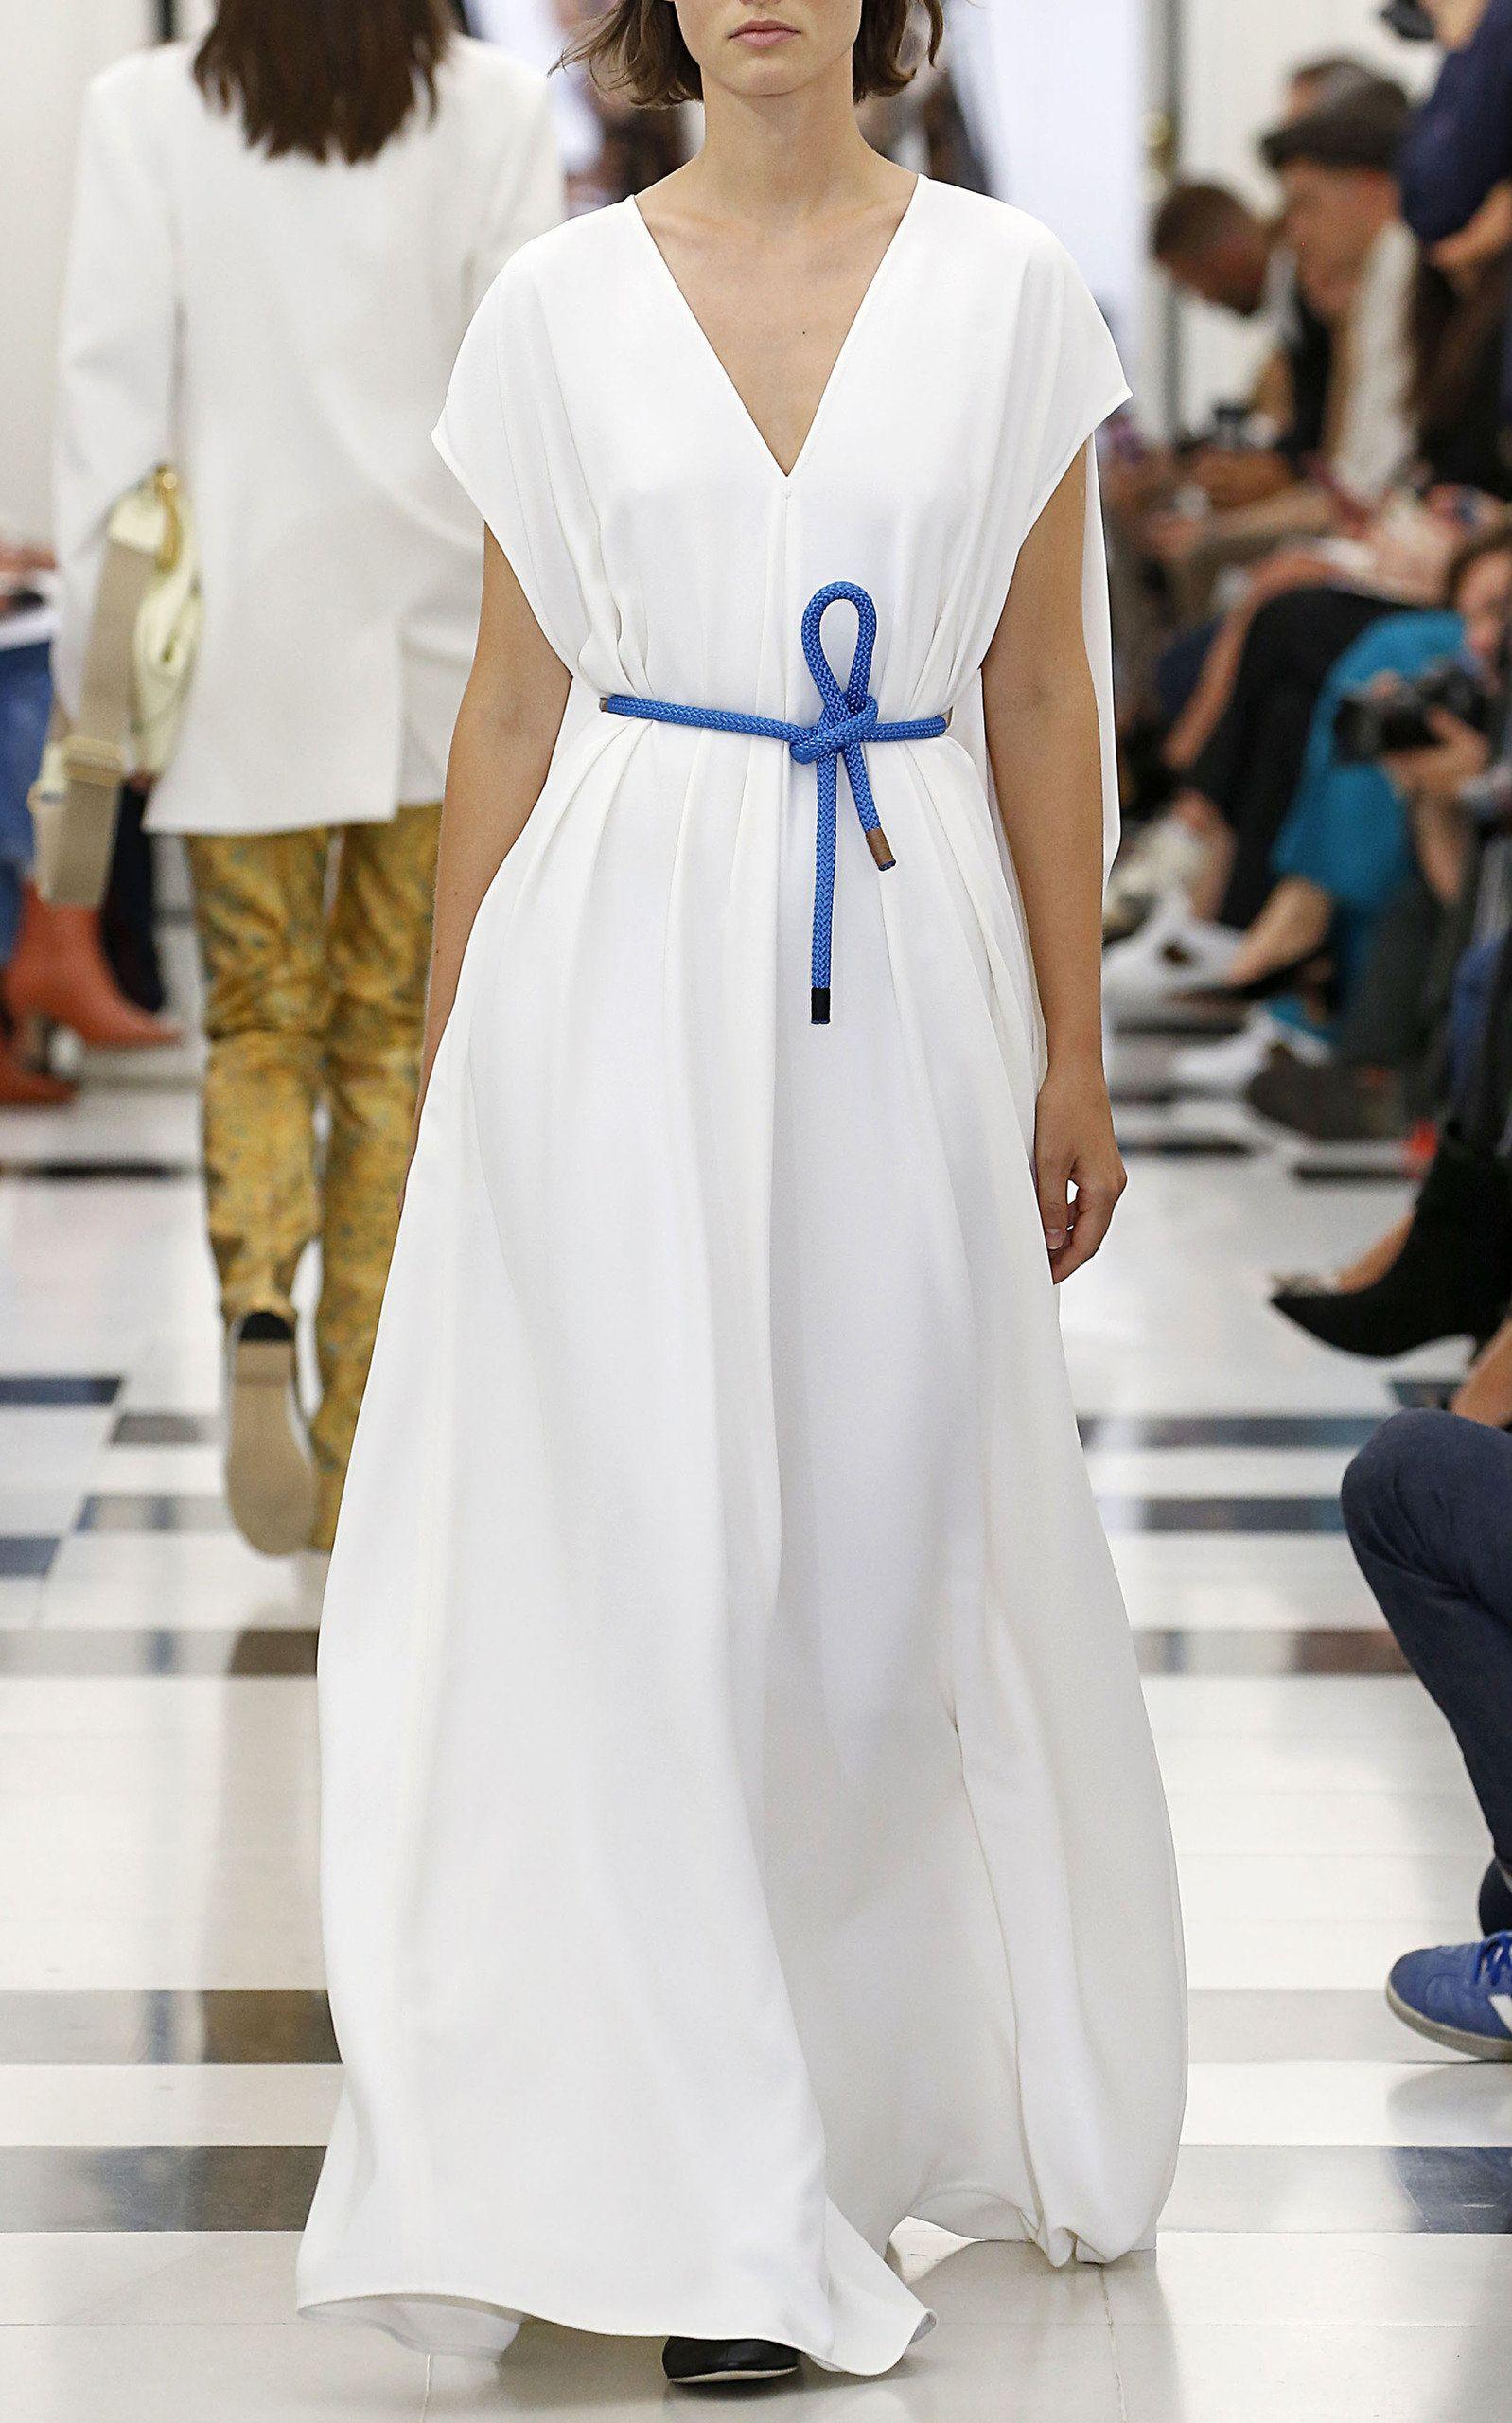 Belted Grain De Poudre Dress By Victoria Beckham For Preorder On Moda Operandi Victoria Beckham White Cotton Maxi Dress Victoria Beckham Collection [ 2560 x 1598 Pixel ]